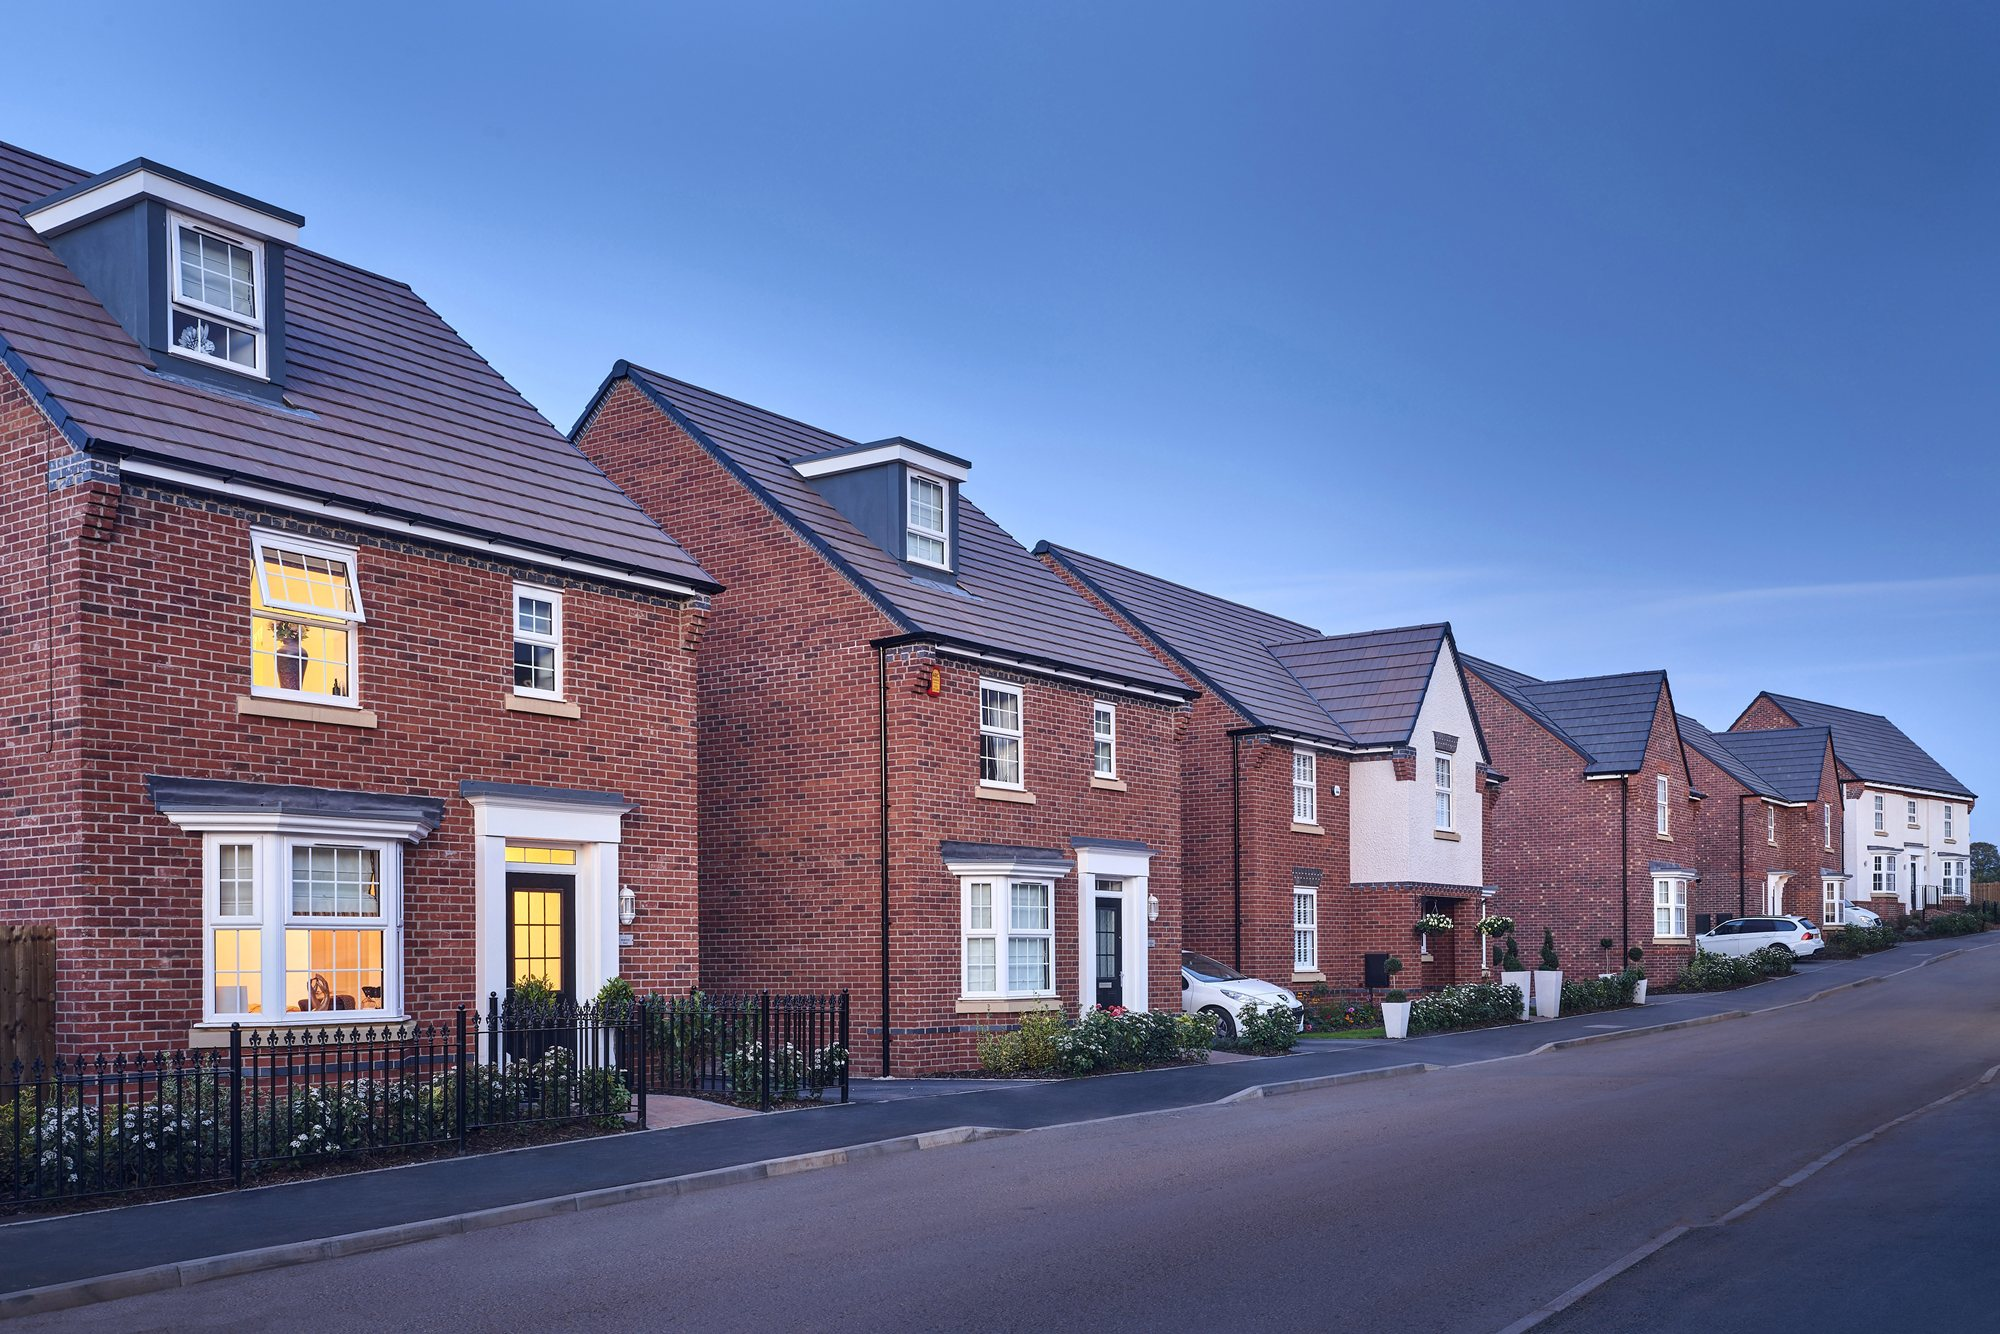 New Build Homes in Bromsgrove